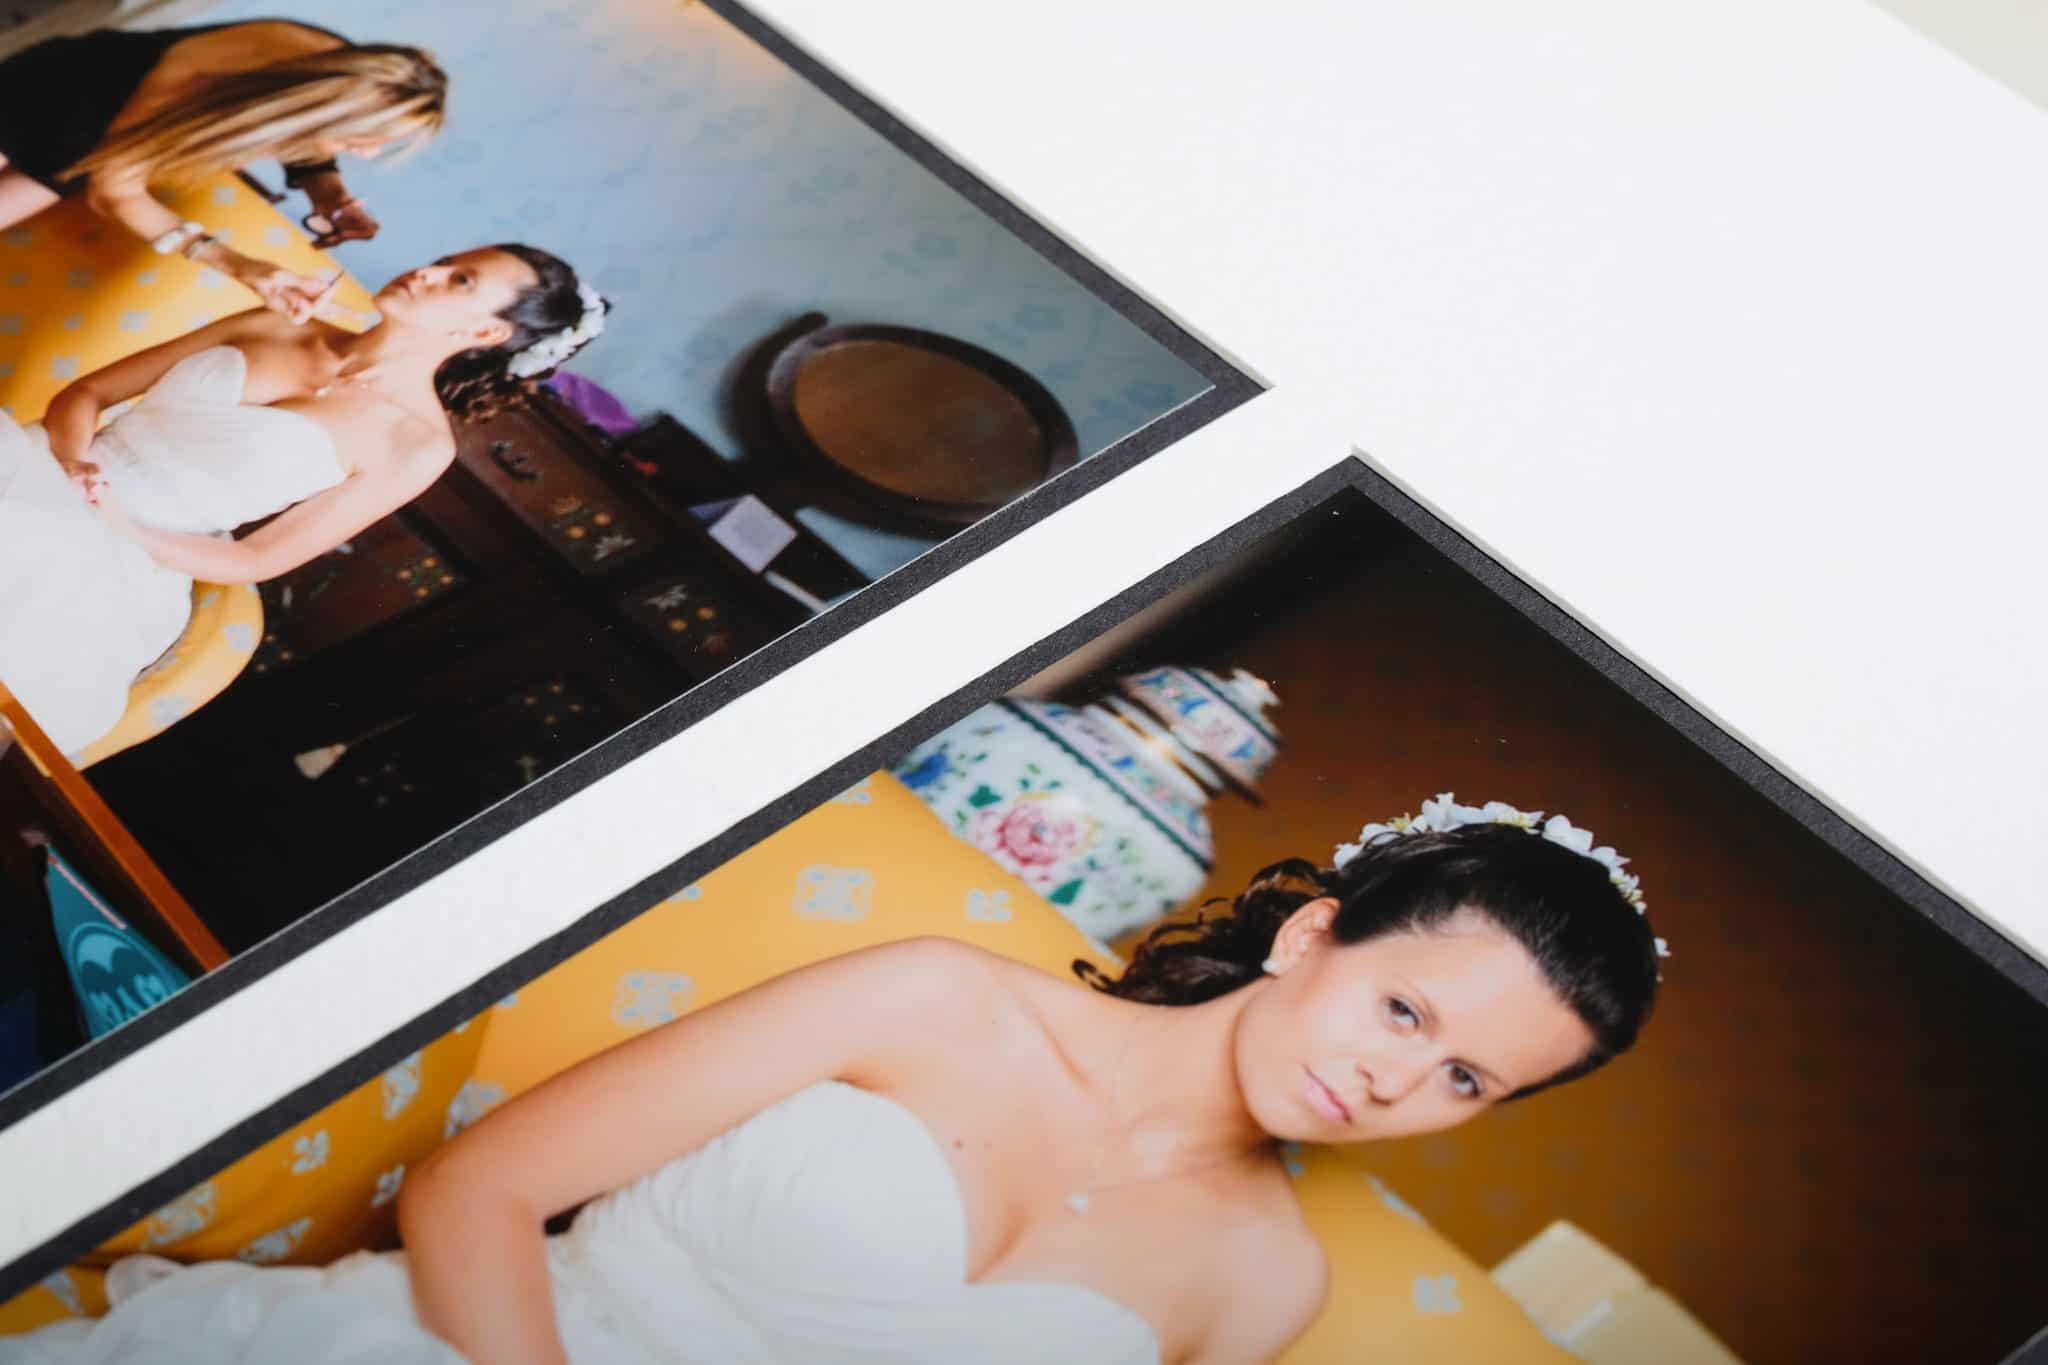 Closeup of pagemounted prints of Queensberry duo pagemount wedding photo album.